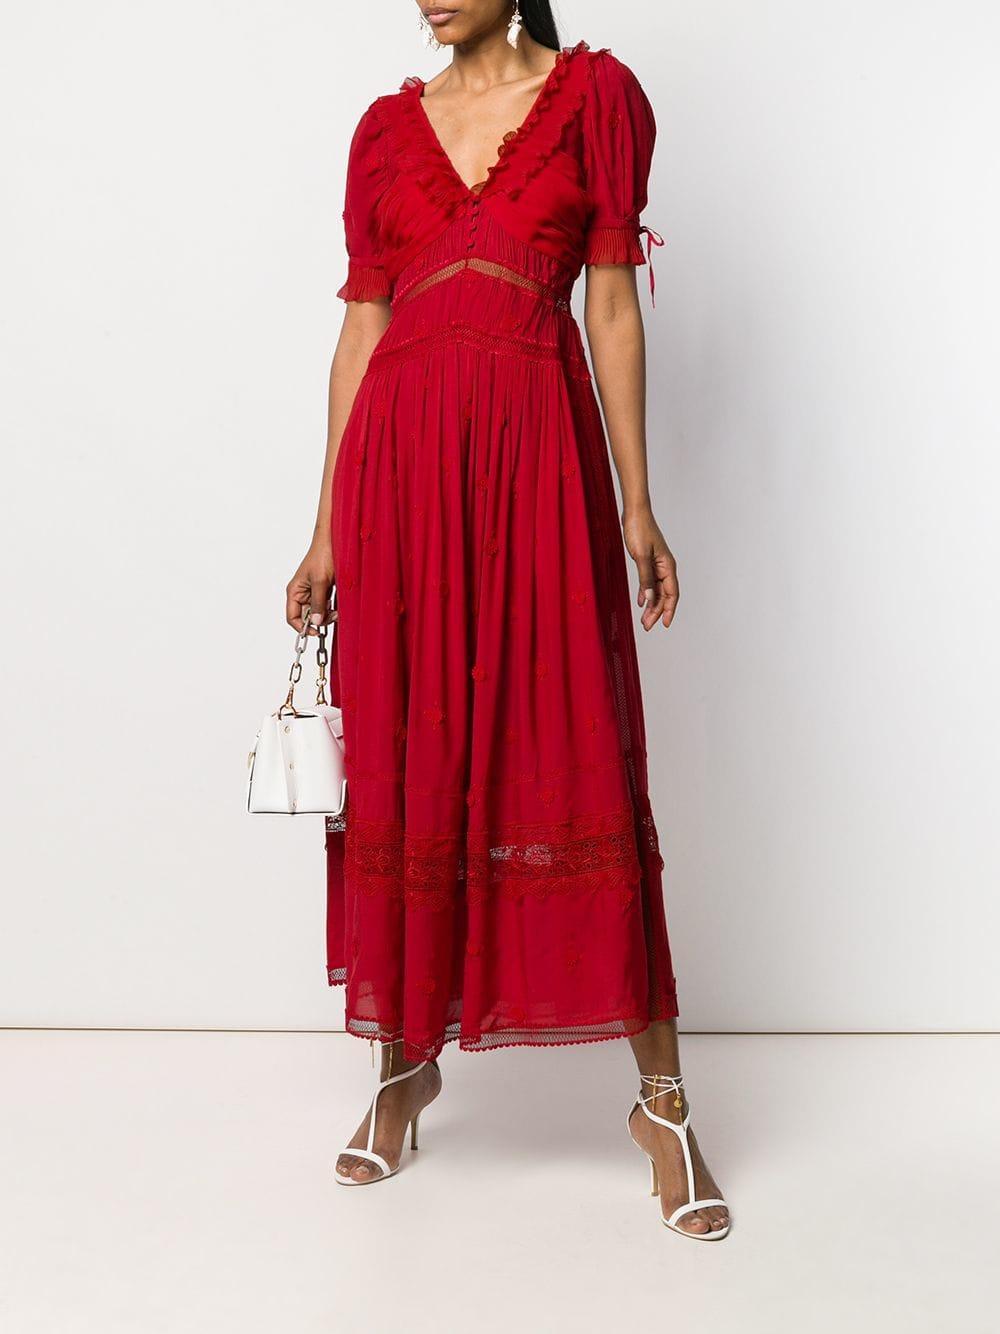 3c3c69f5d1c Self-Portrait Midi Lace Dress in Red - Lyst